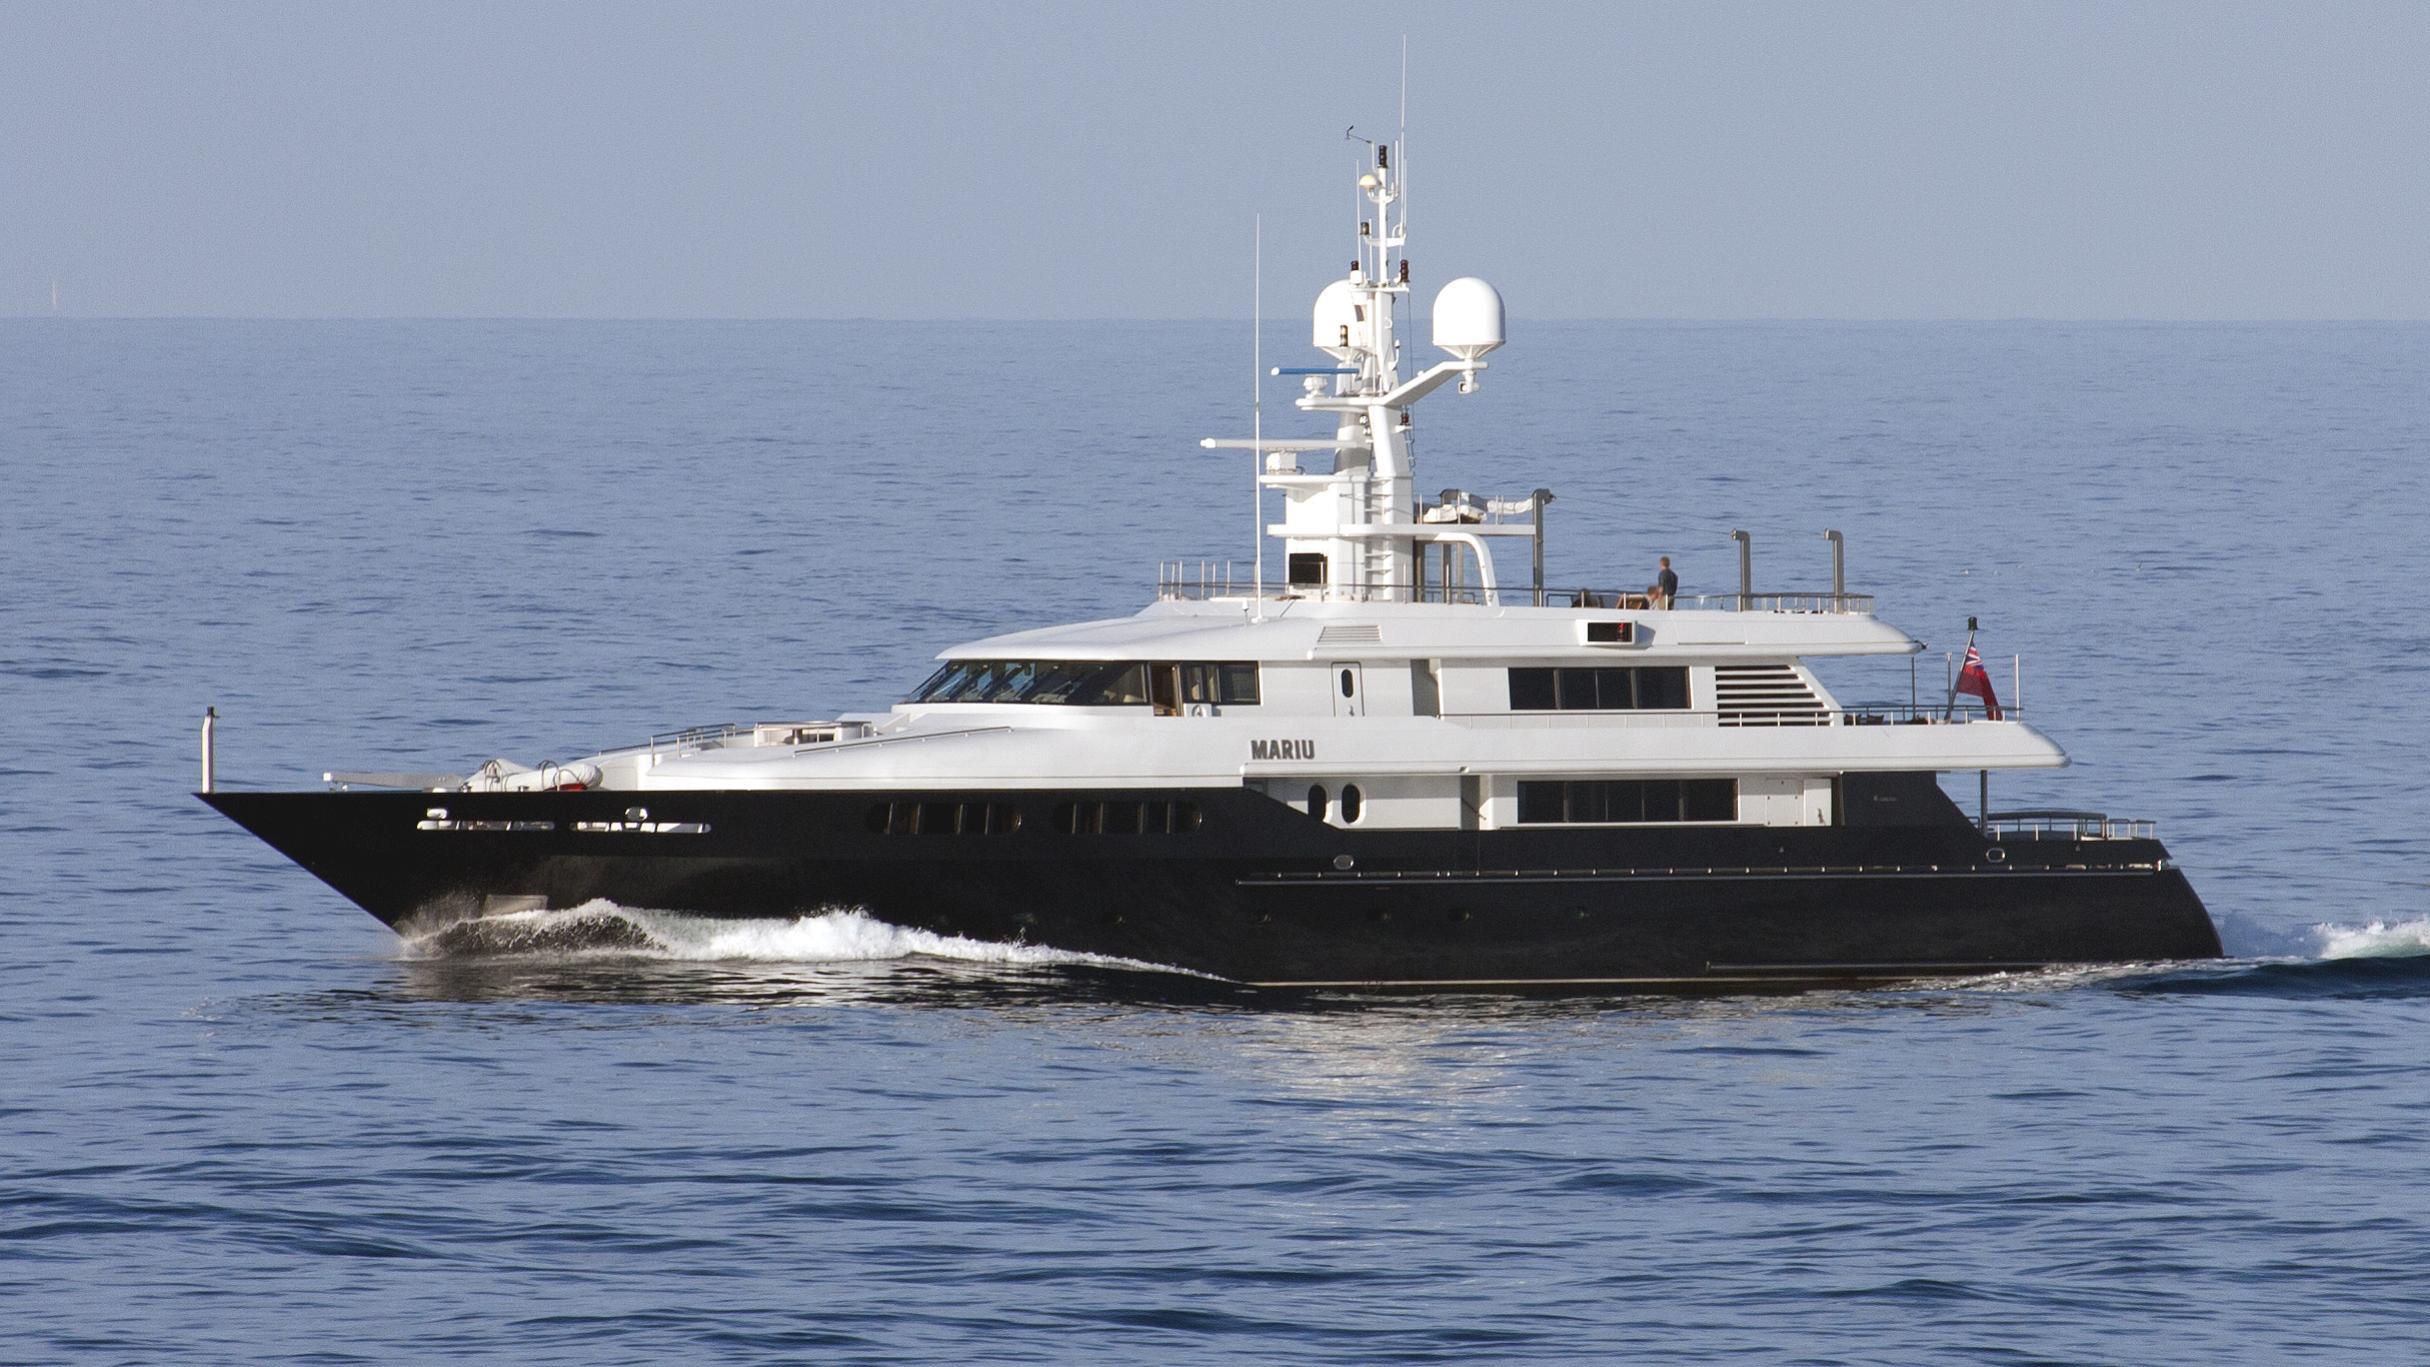 mariu-yacht-exterior